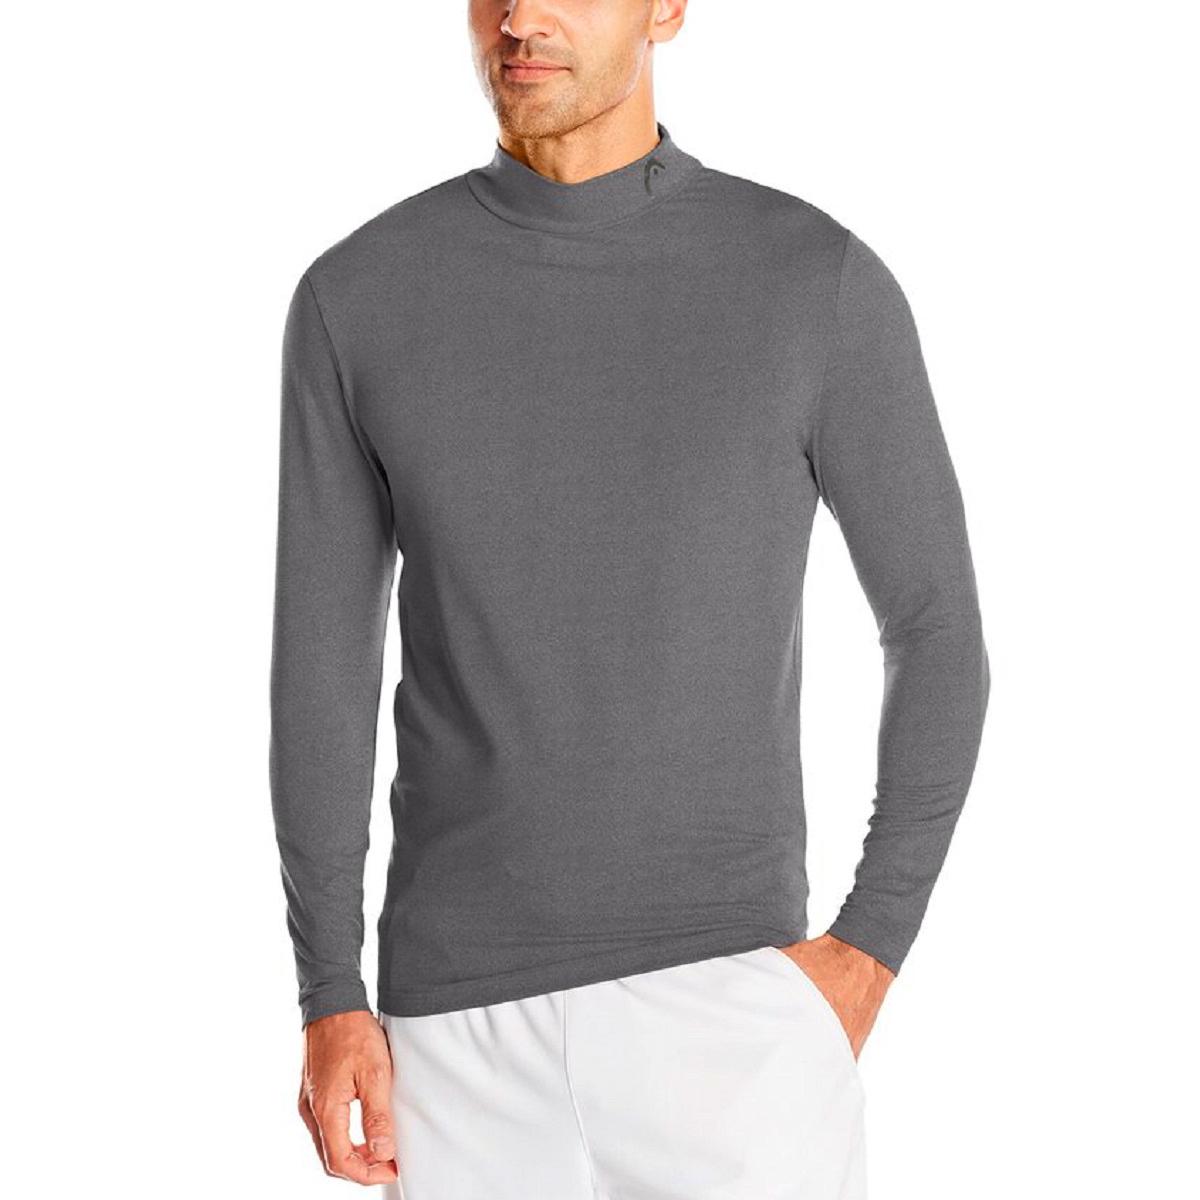 Head Men S Compression Shirt Base Layer Athletic Mock Neck